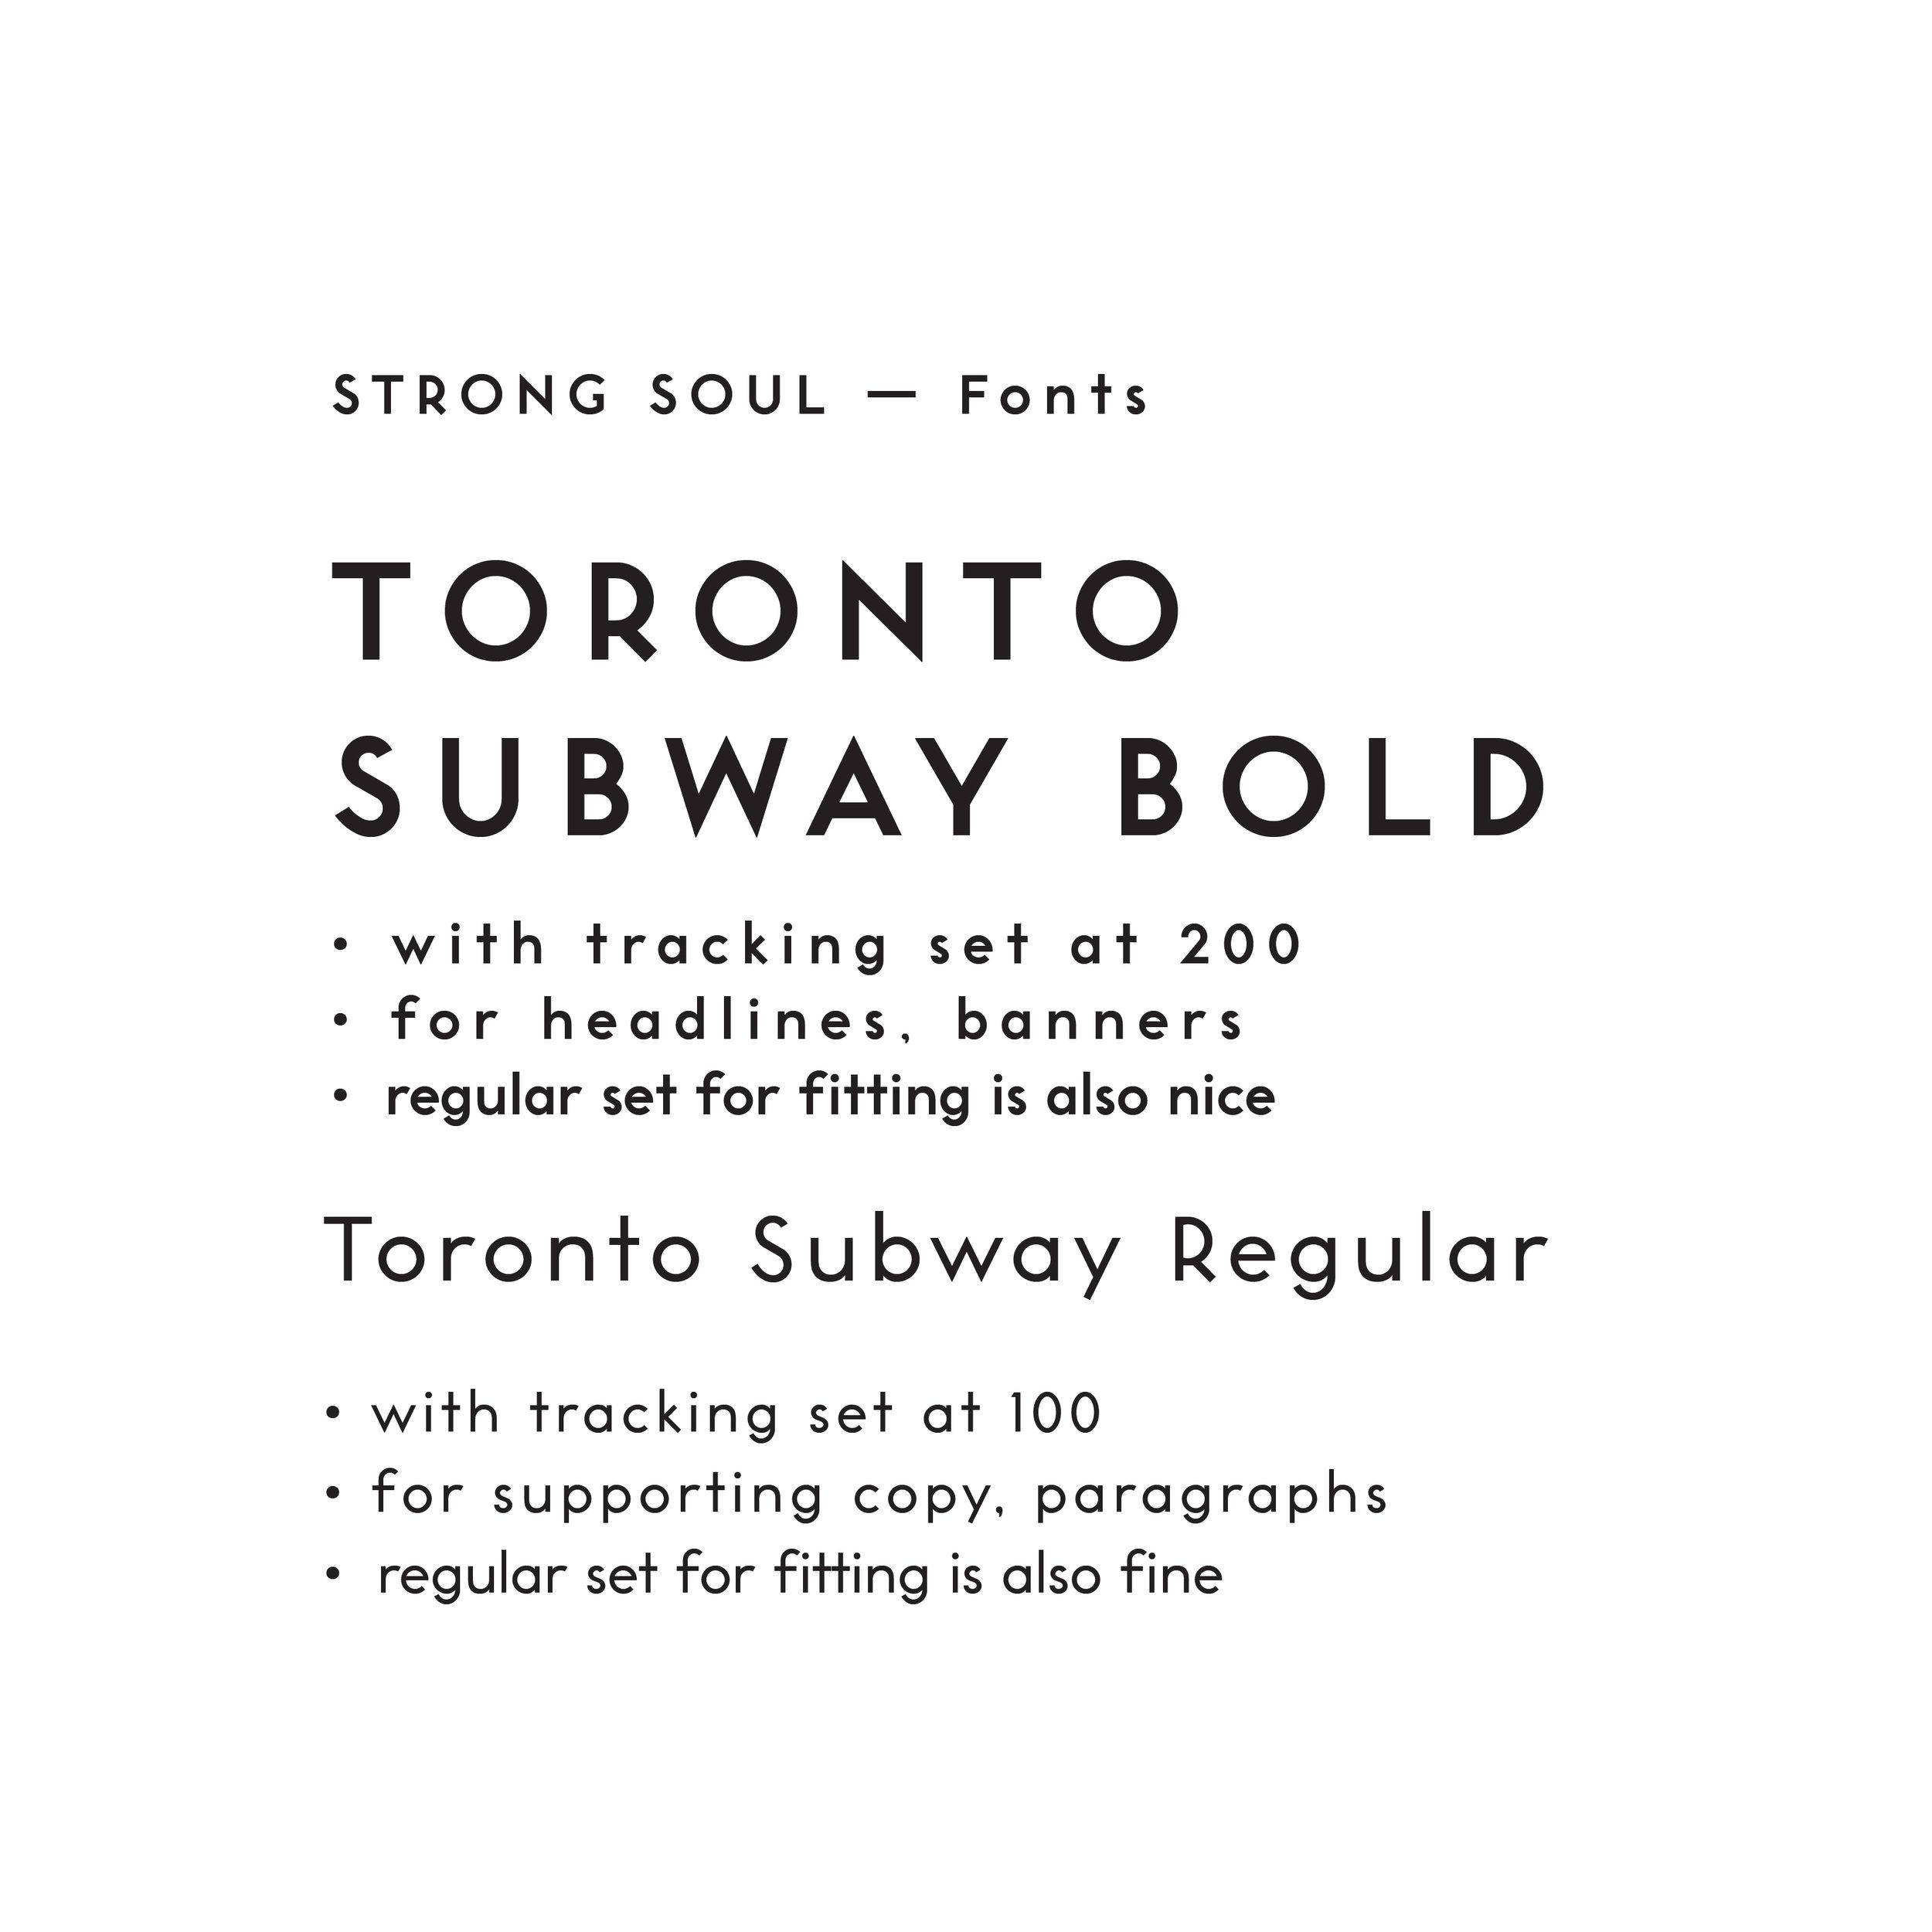 SSFF_Brand-Identity_Brand-Guide_Fonts-1.jpg